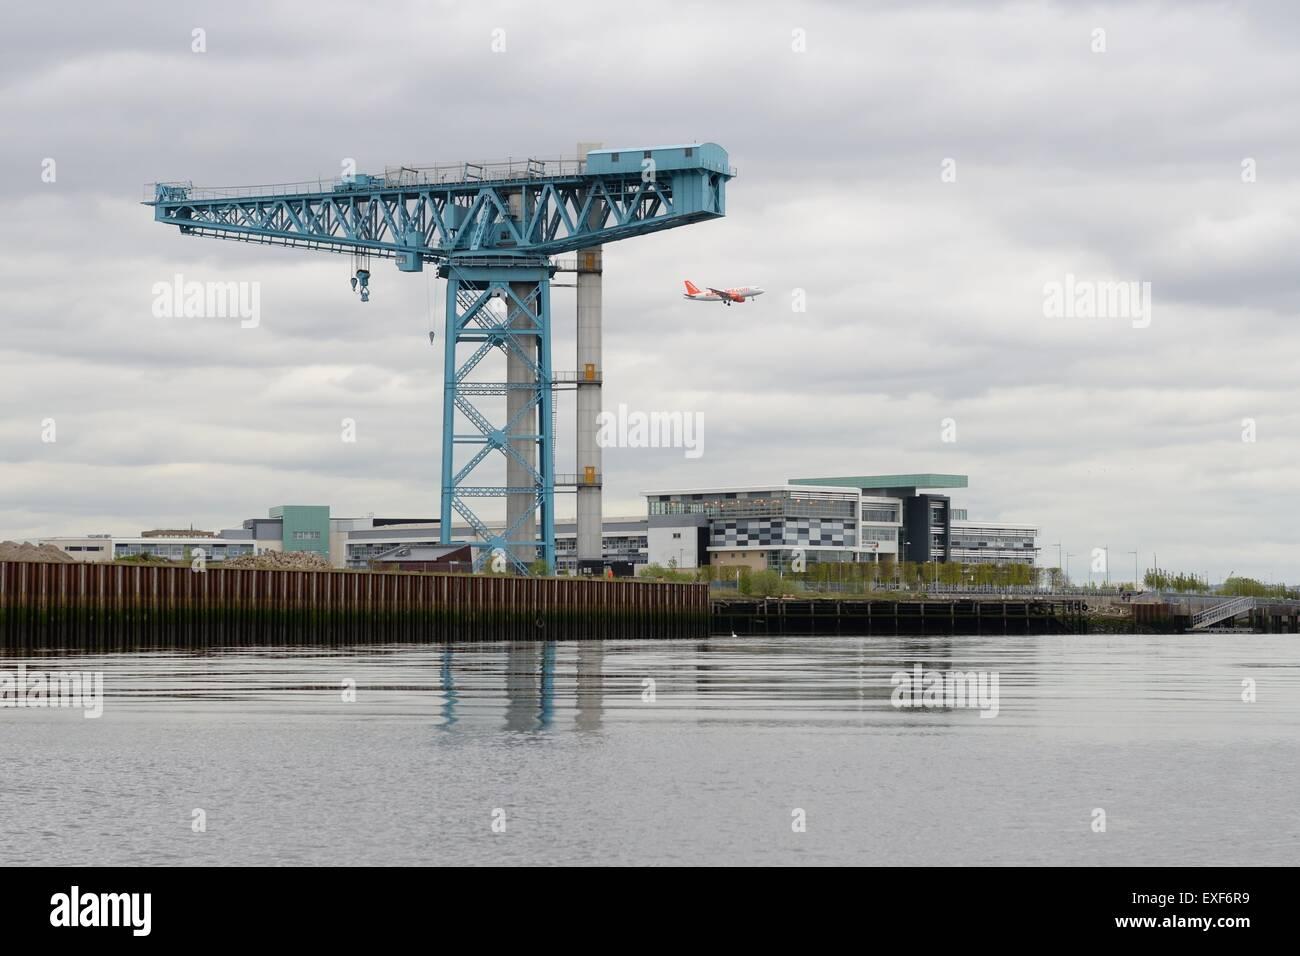 Titan crane in Clydebank, Glasgow, Scotland, UK - Stock Image